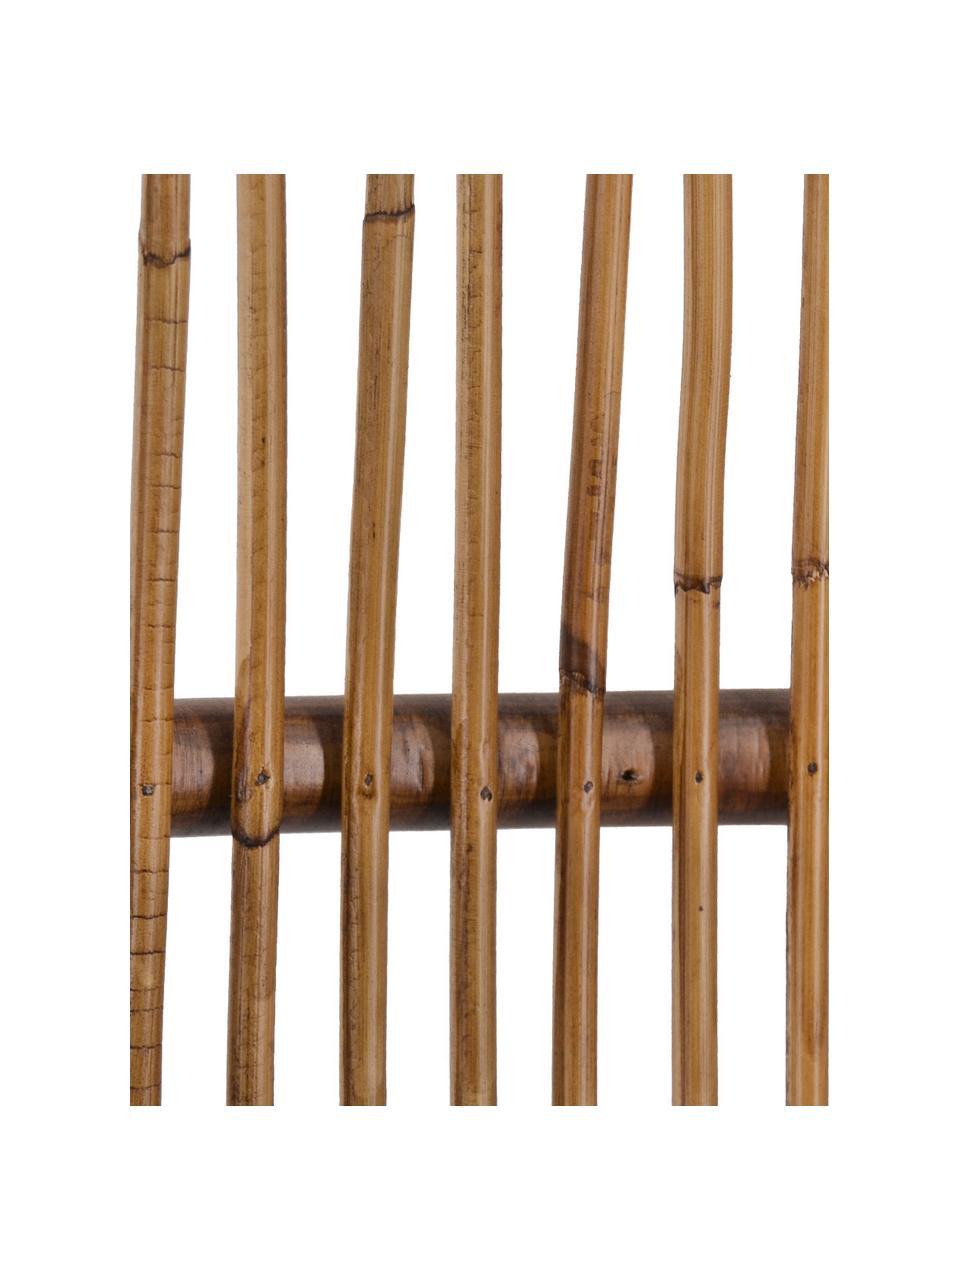 Poltroncina in legno di mindi e bambù Bambu, Struttura: legno di Mindi, Marrone, Larg. 60 x Prof. 56 cm